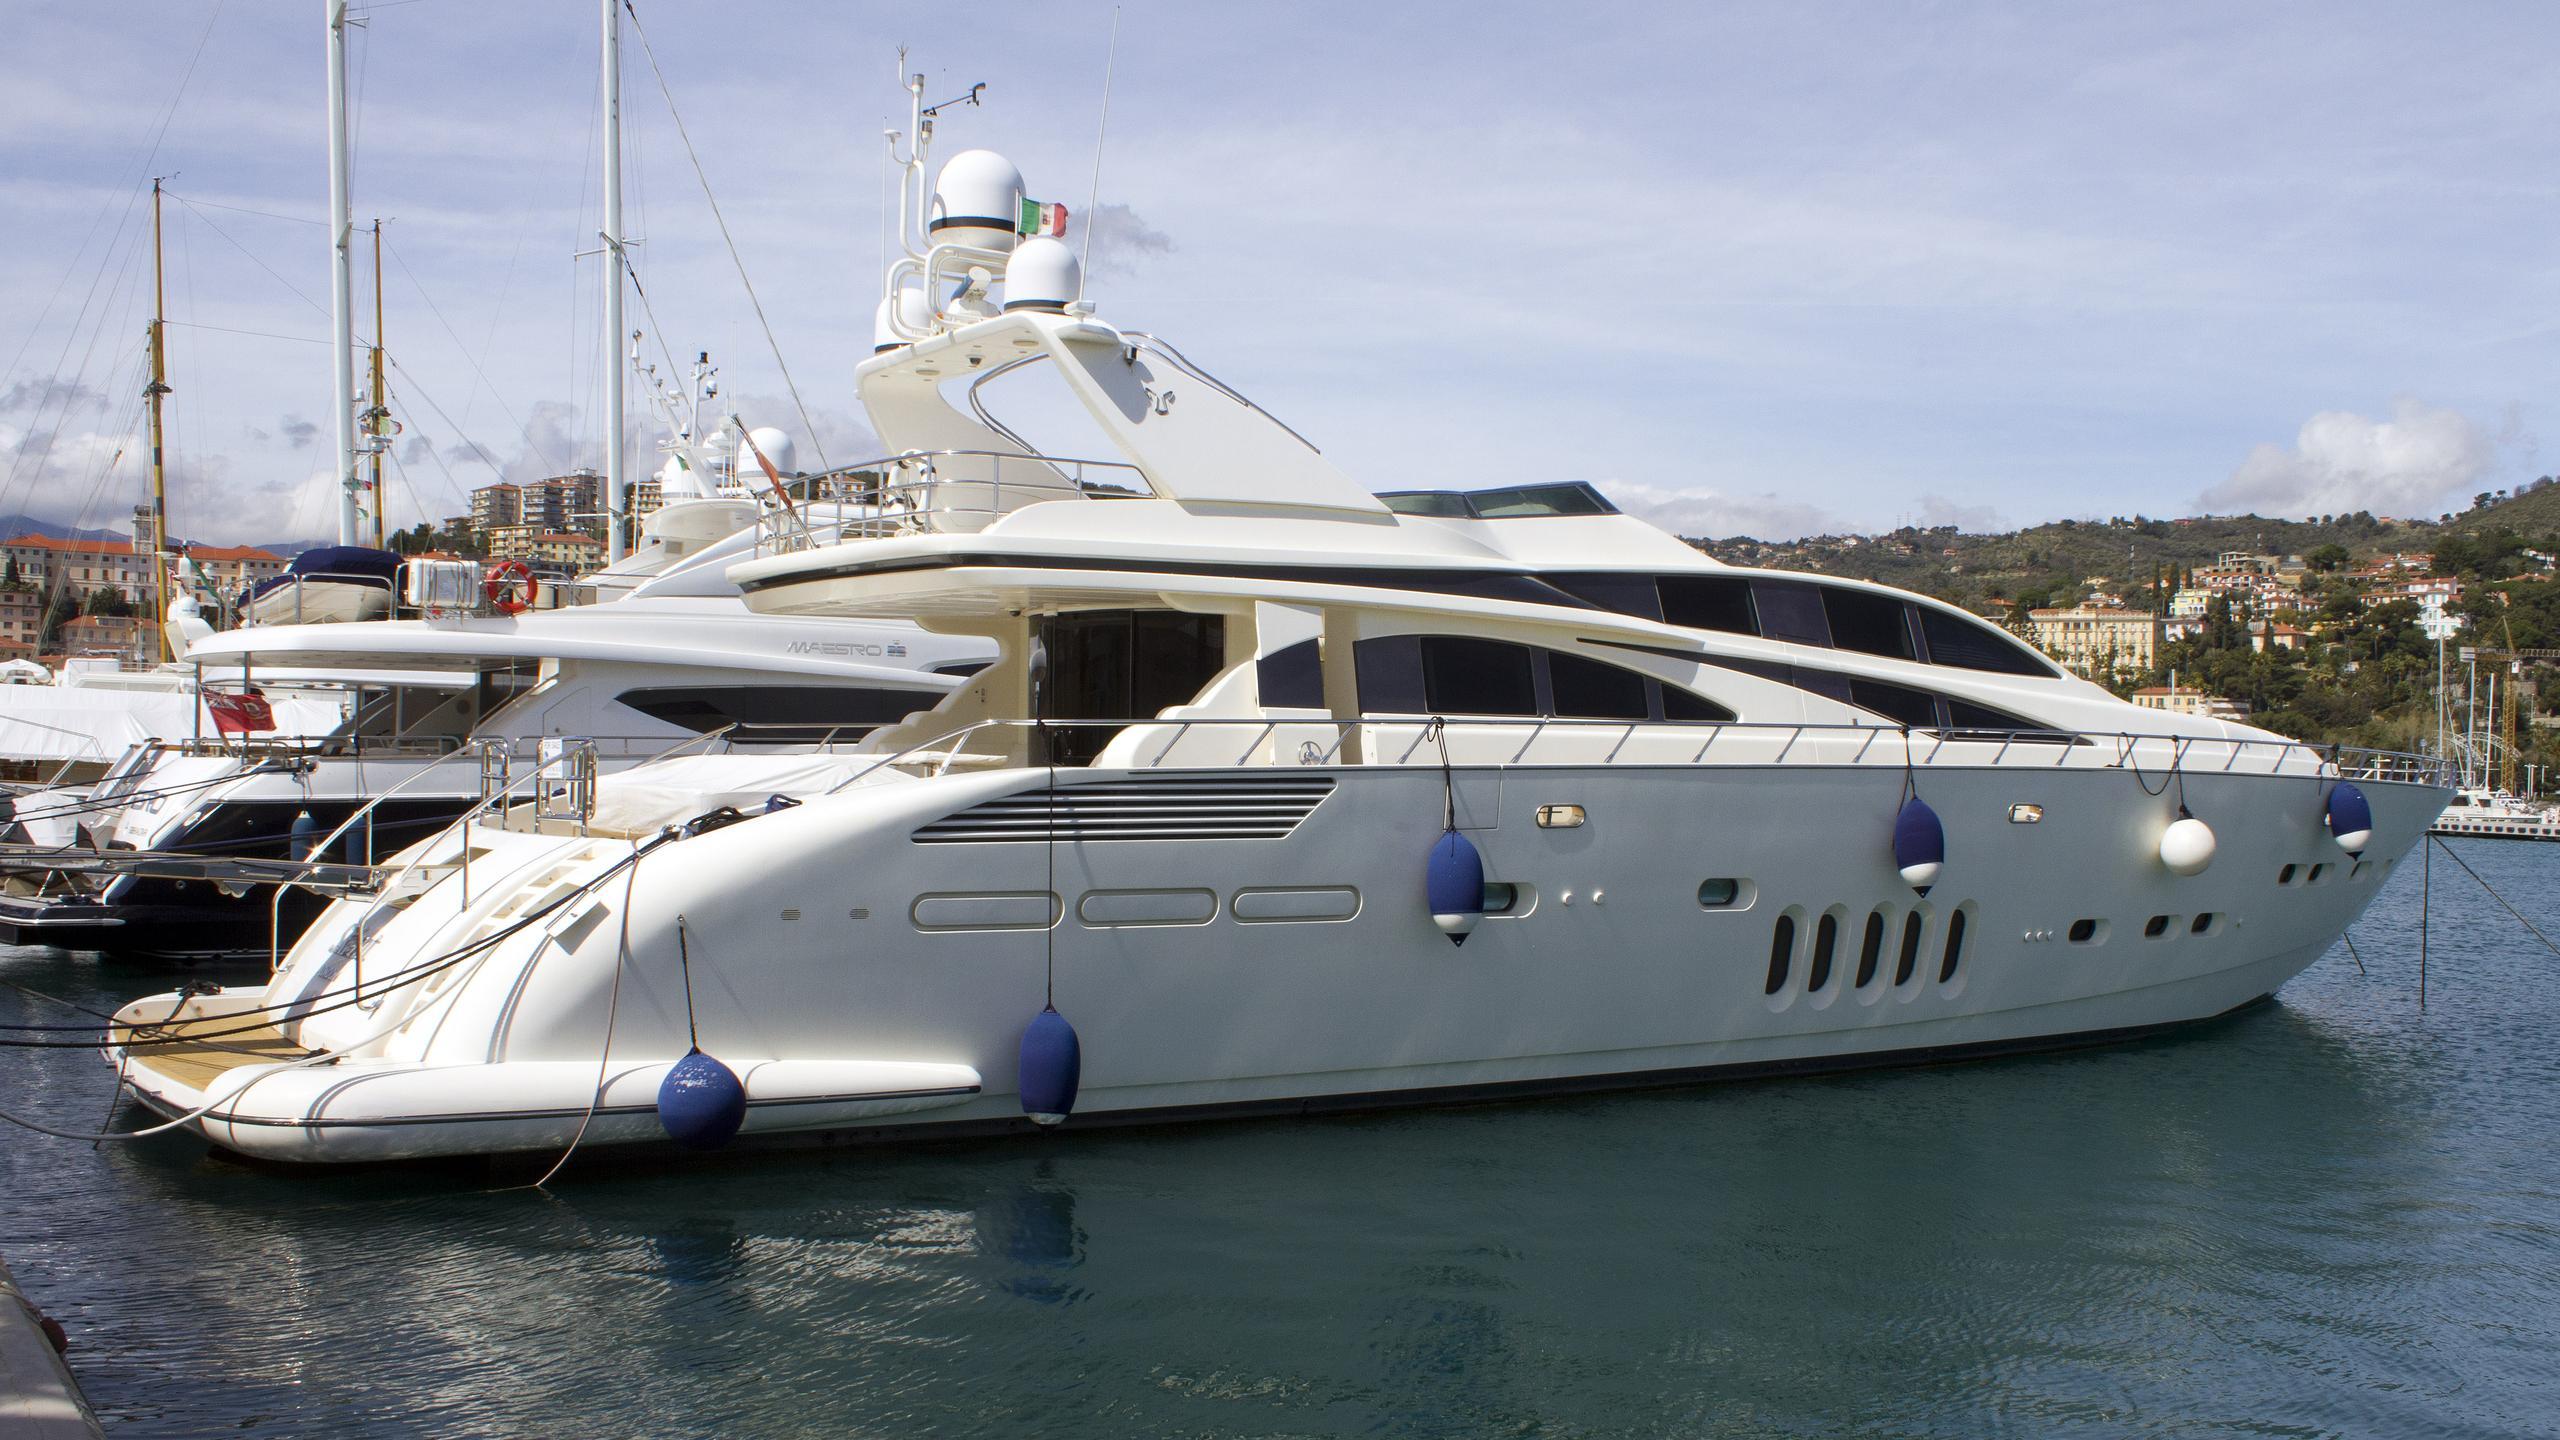 skiant-motor-yacht-arno-leopard-32m-sport-2006-moored